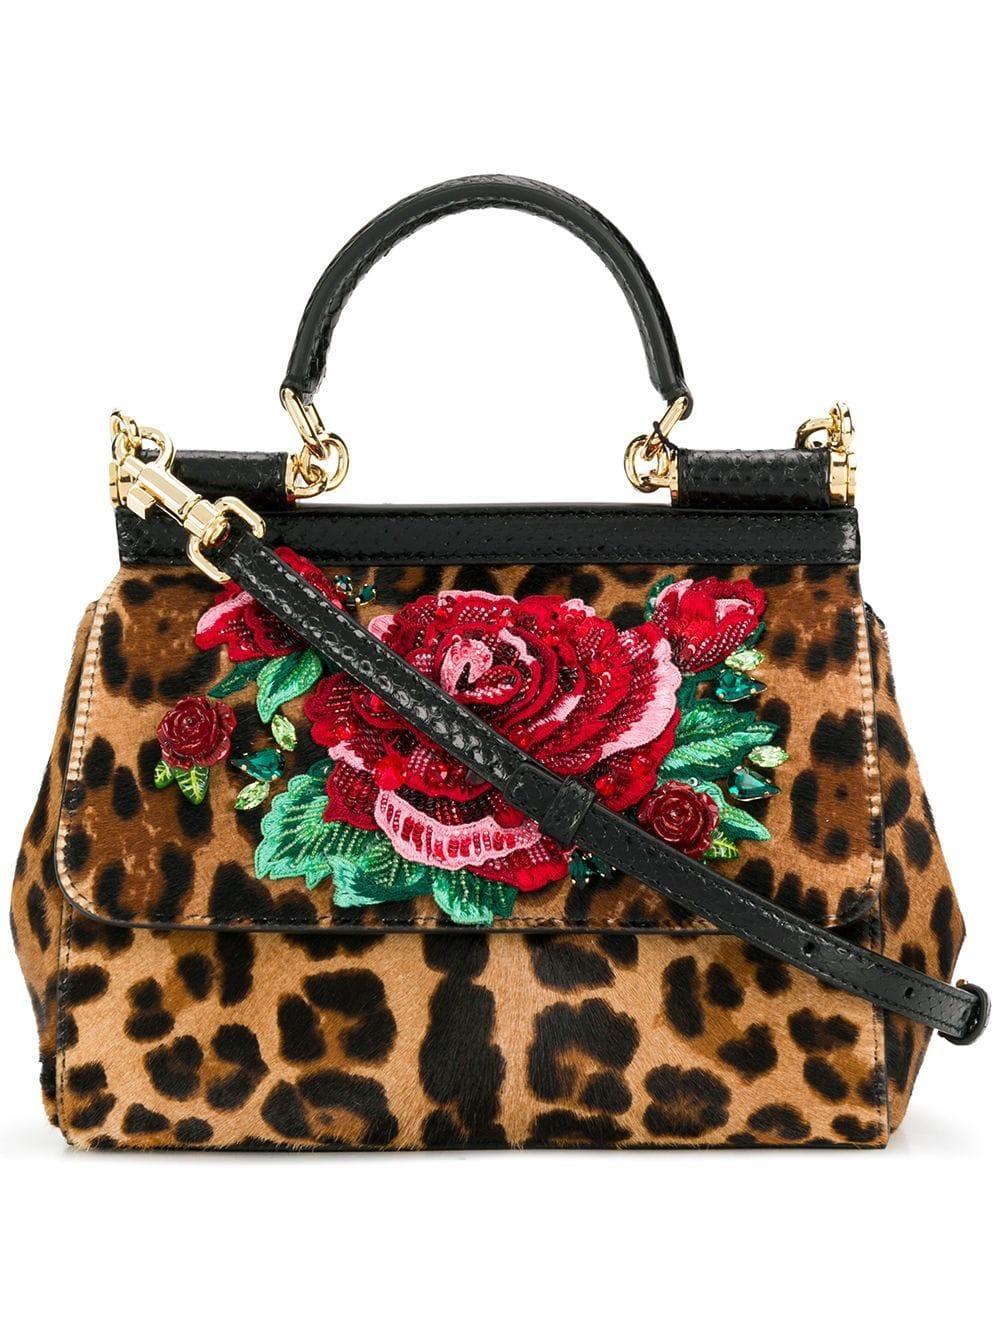 c9debc4ebc Lyst - Dolce & Gabbana Leopard Print Sicily Cross Body Bag - Save 20%